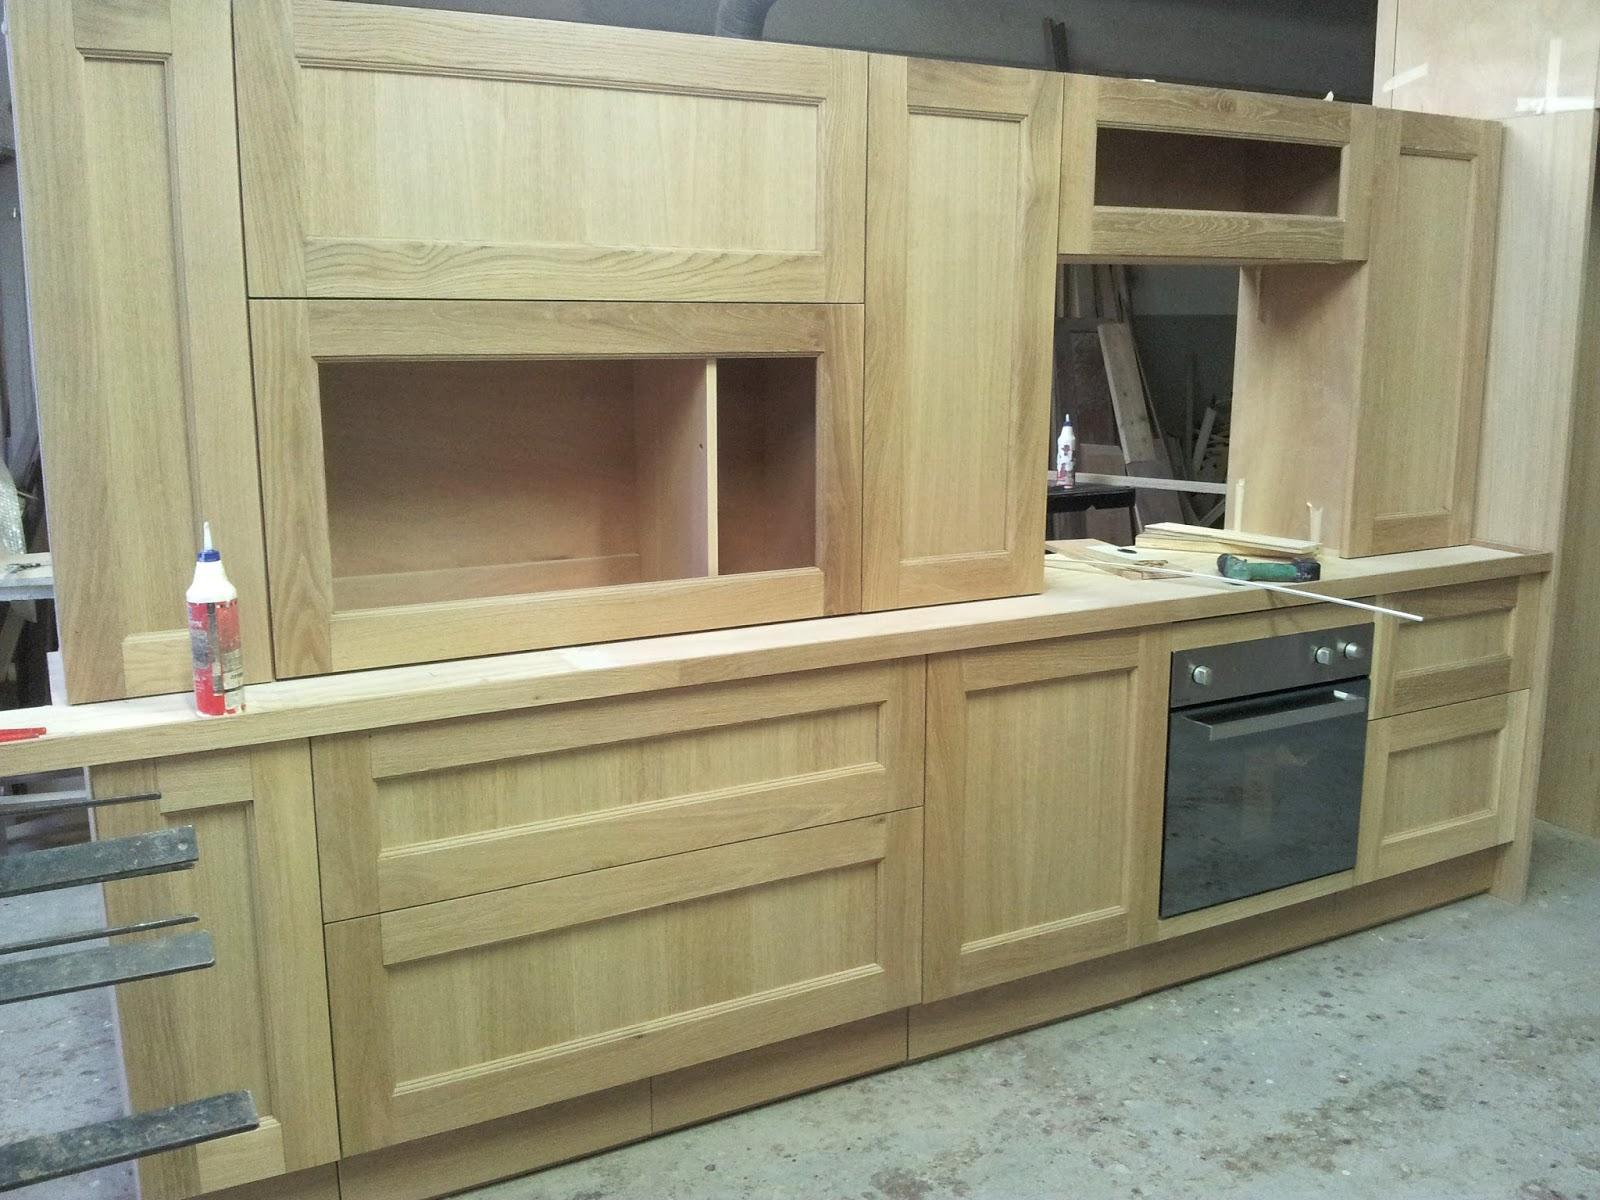 Costruire Un Piano Cucina In Legno : Costruire un piano cucina in legno come costruire un isola per